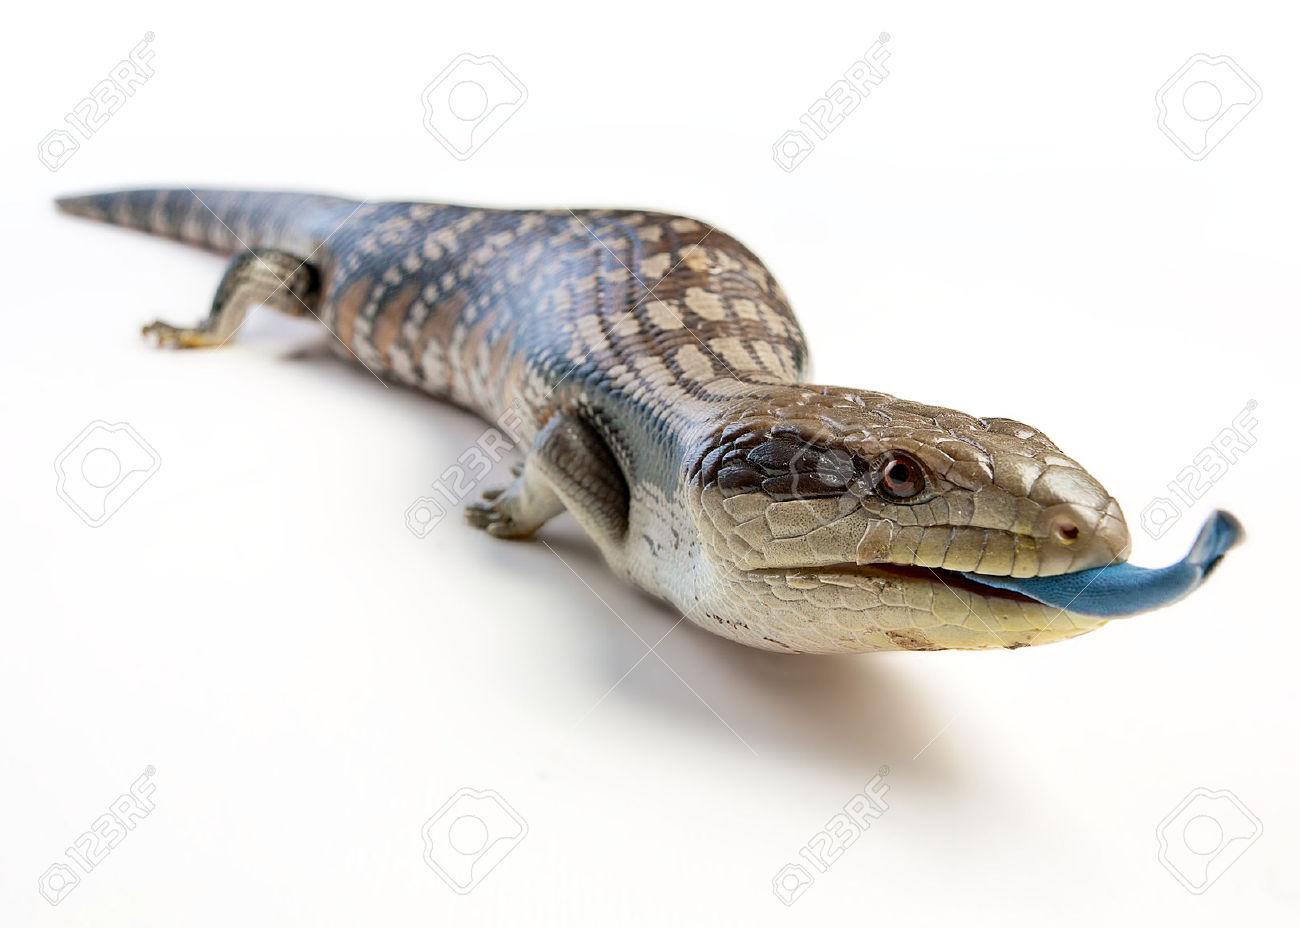 Blue Tongue Lizard clipart #18, Download drawings